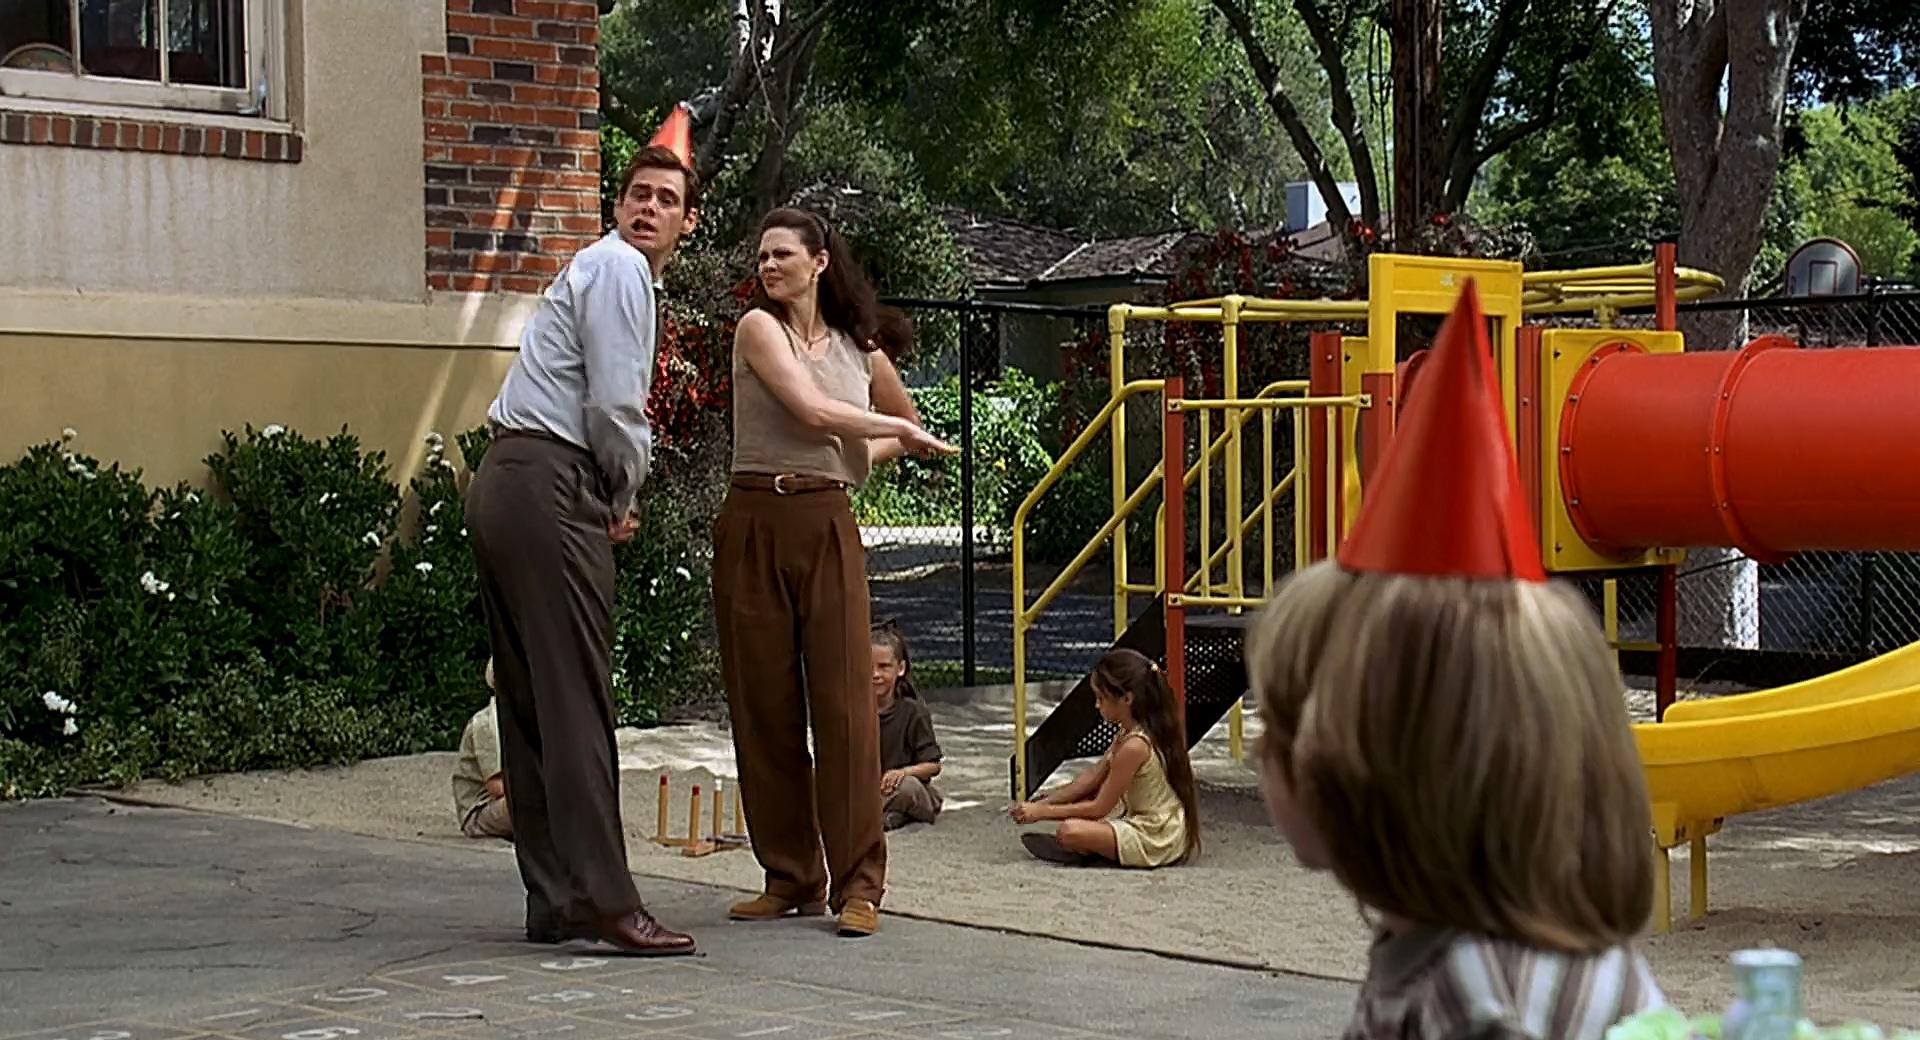 Jim Carrey, Hope Allen, and Justin Cooper in Liar Liar (1997)